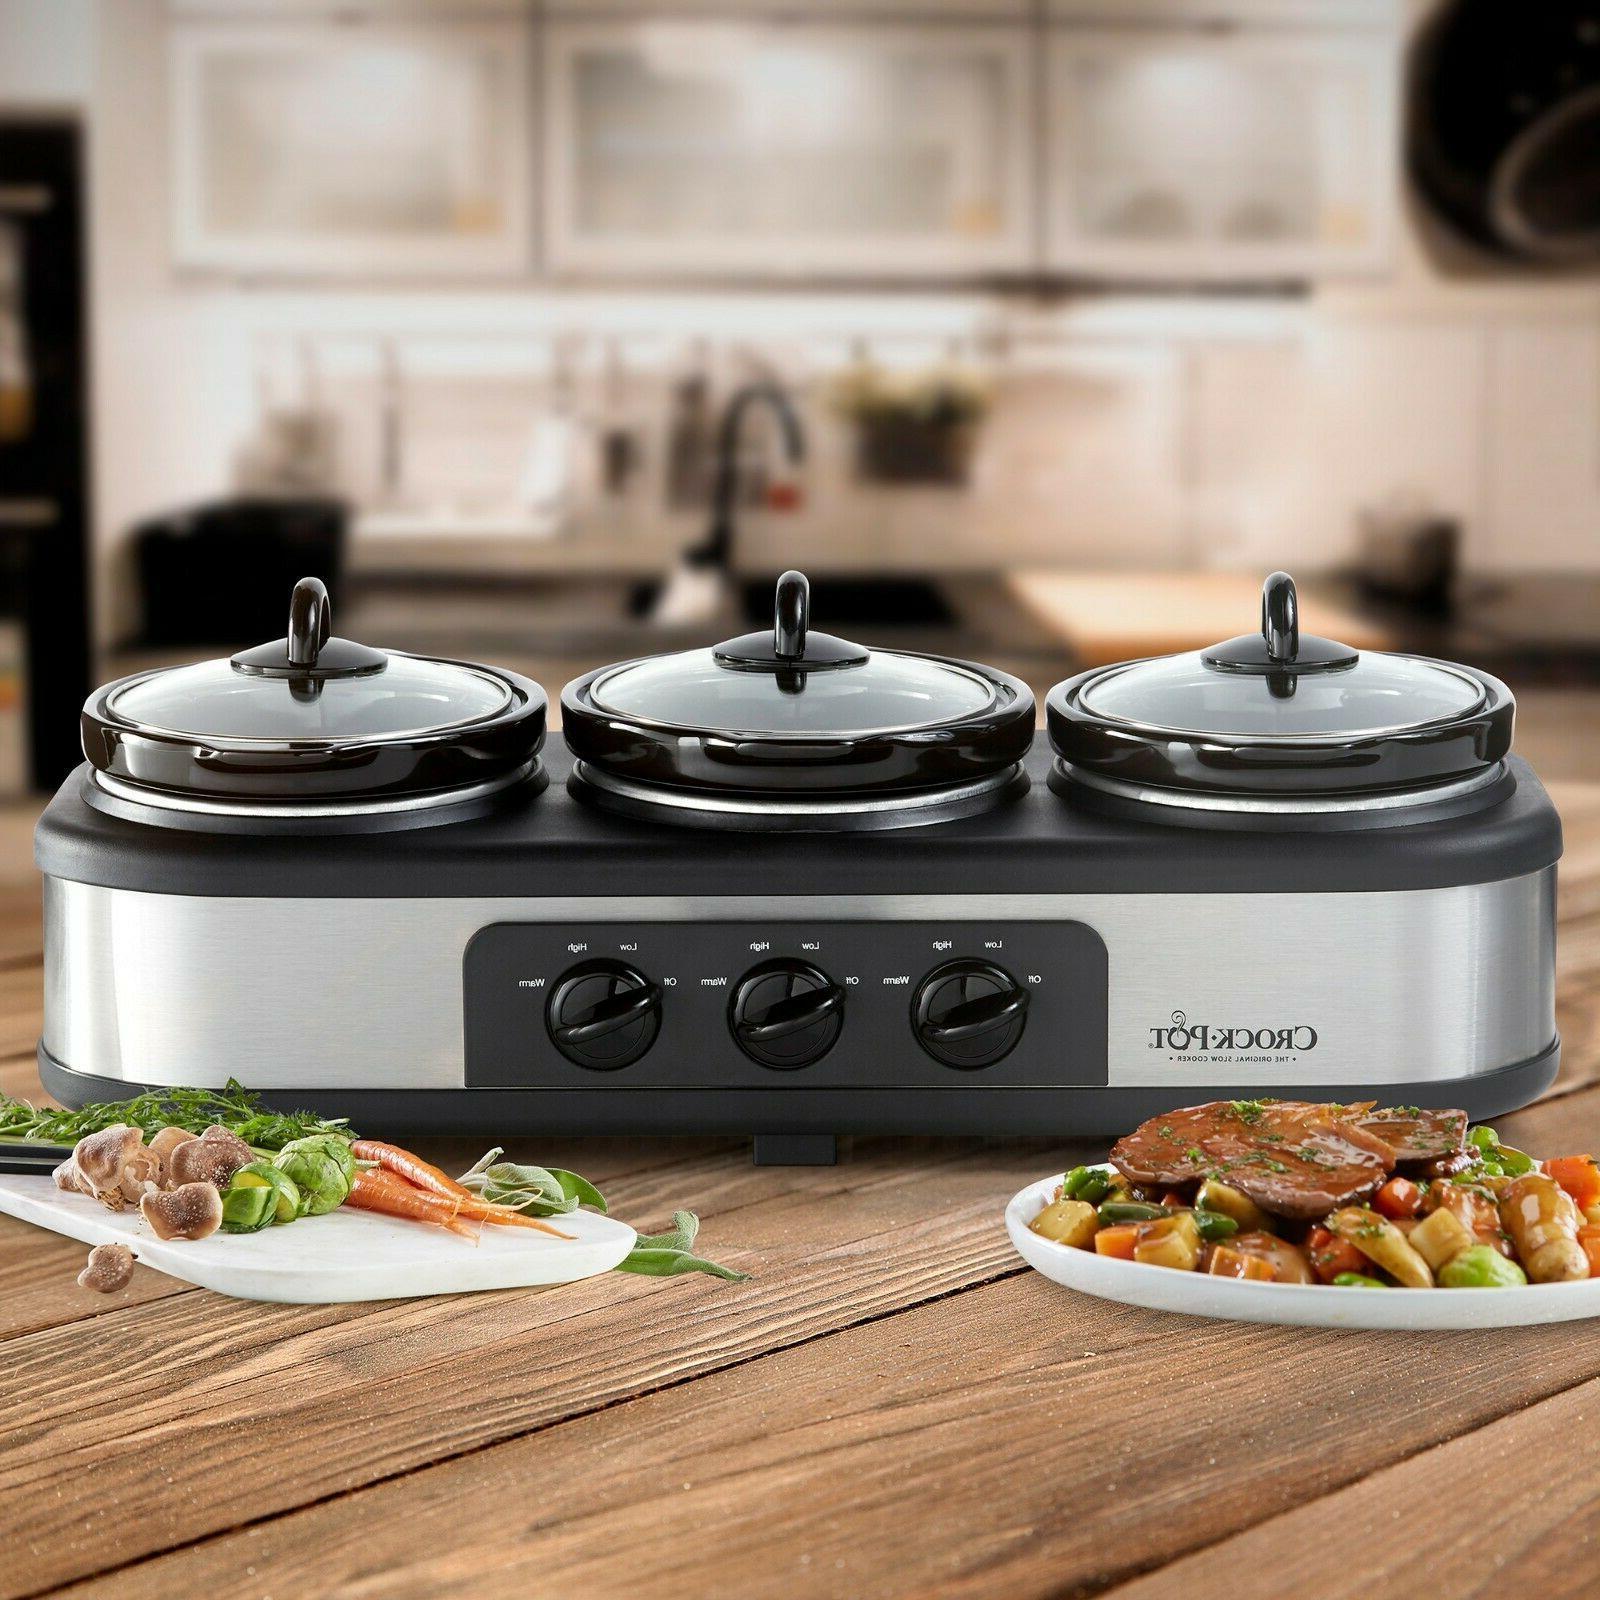 Crock-Pot Serve Food Stainless